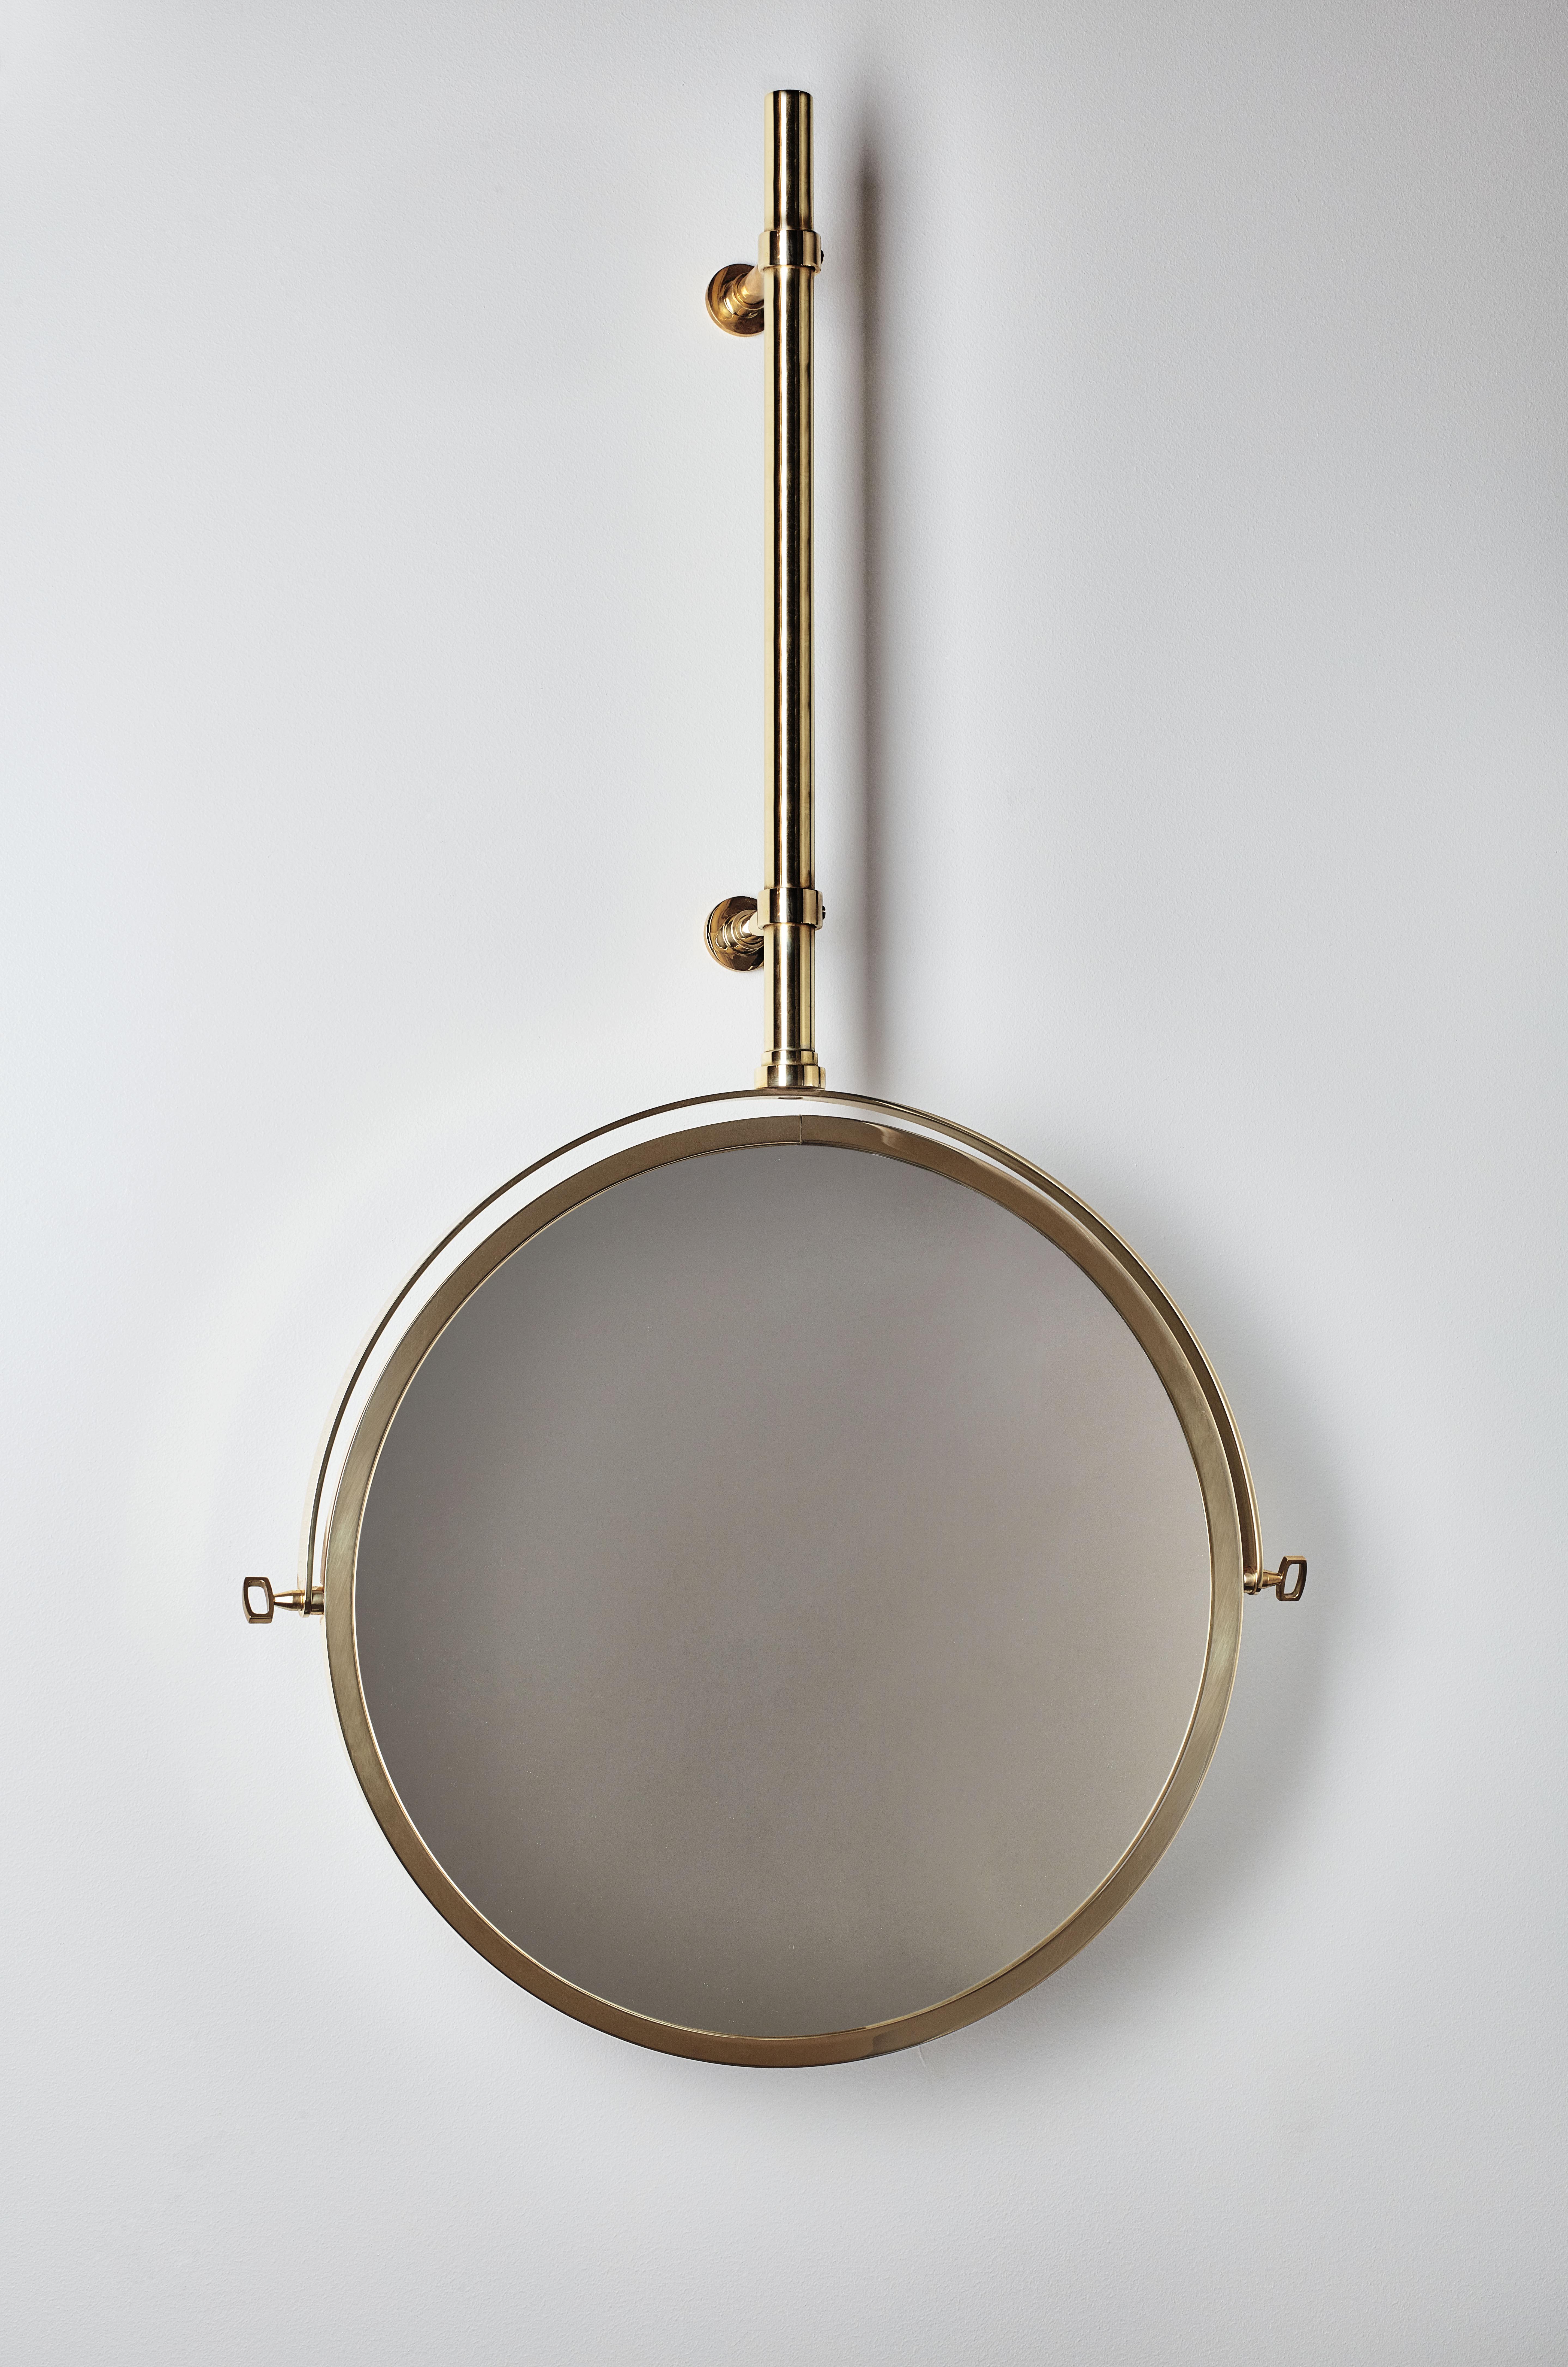 Miroir mural mbe orientable 44 cm laiton dcw ditions for Miroir orientable